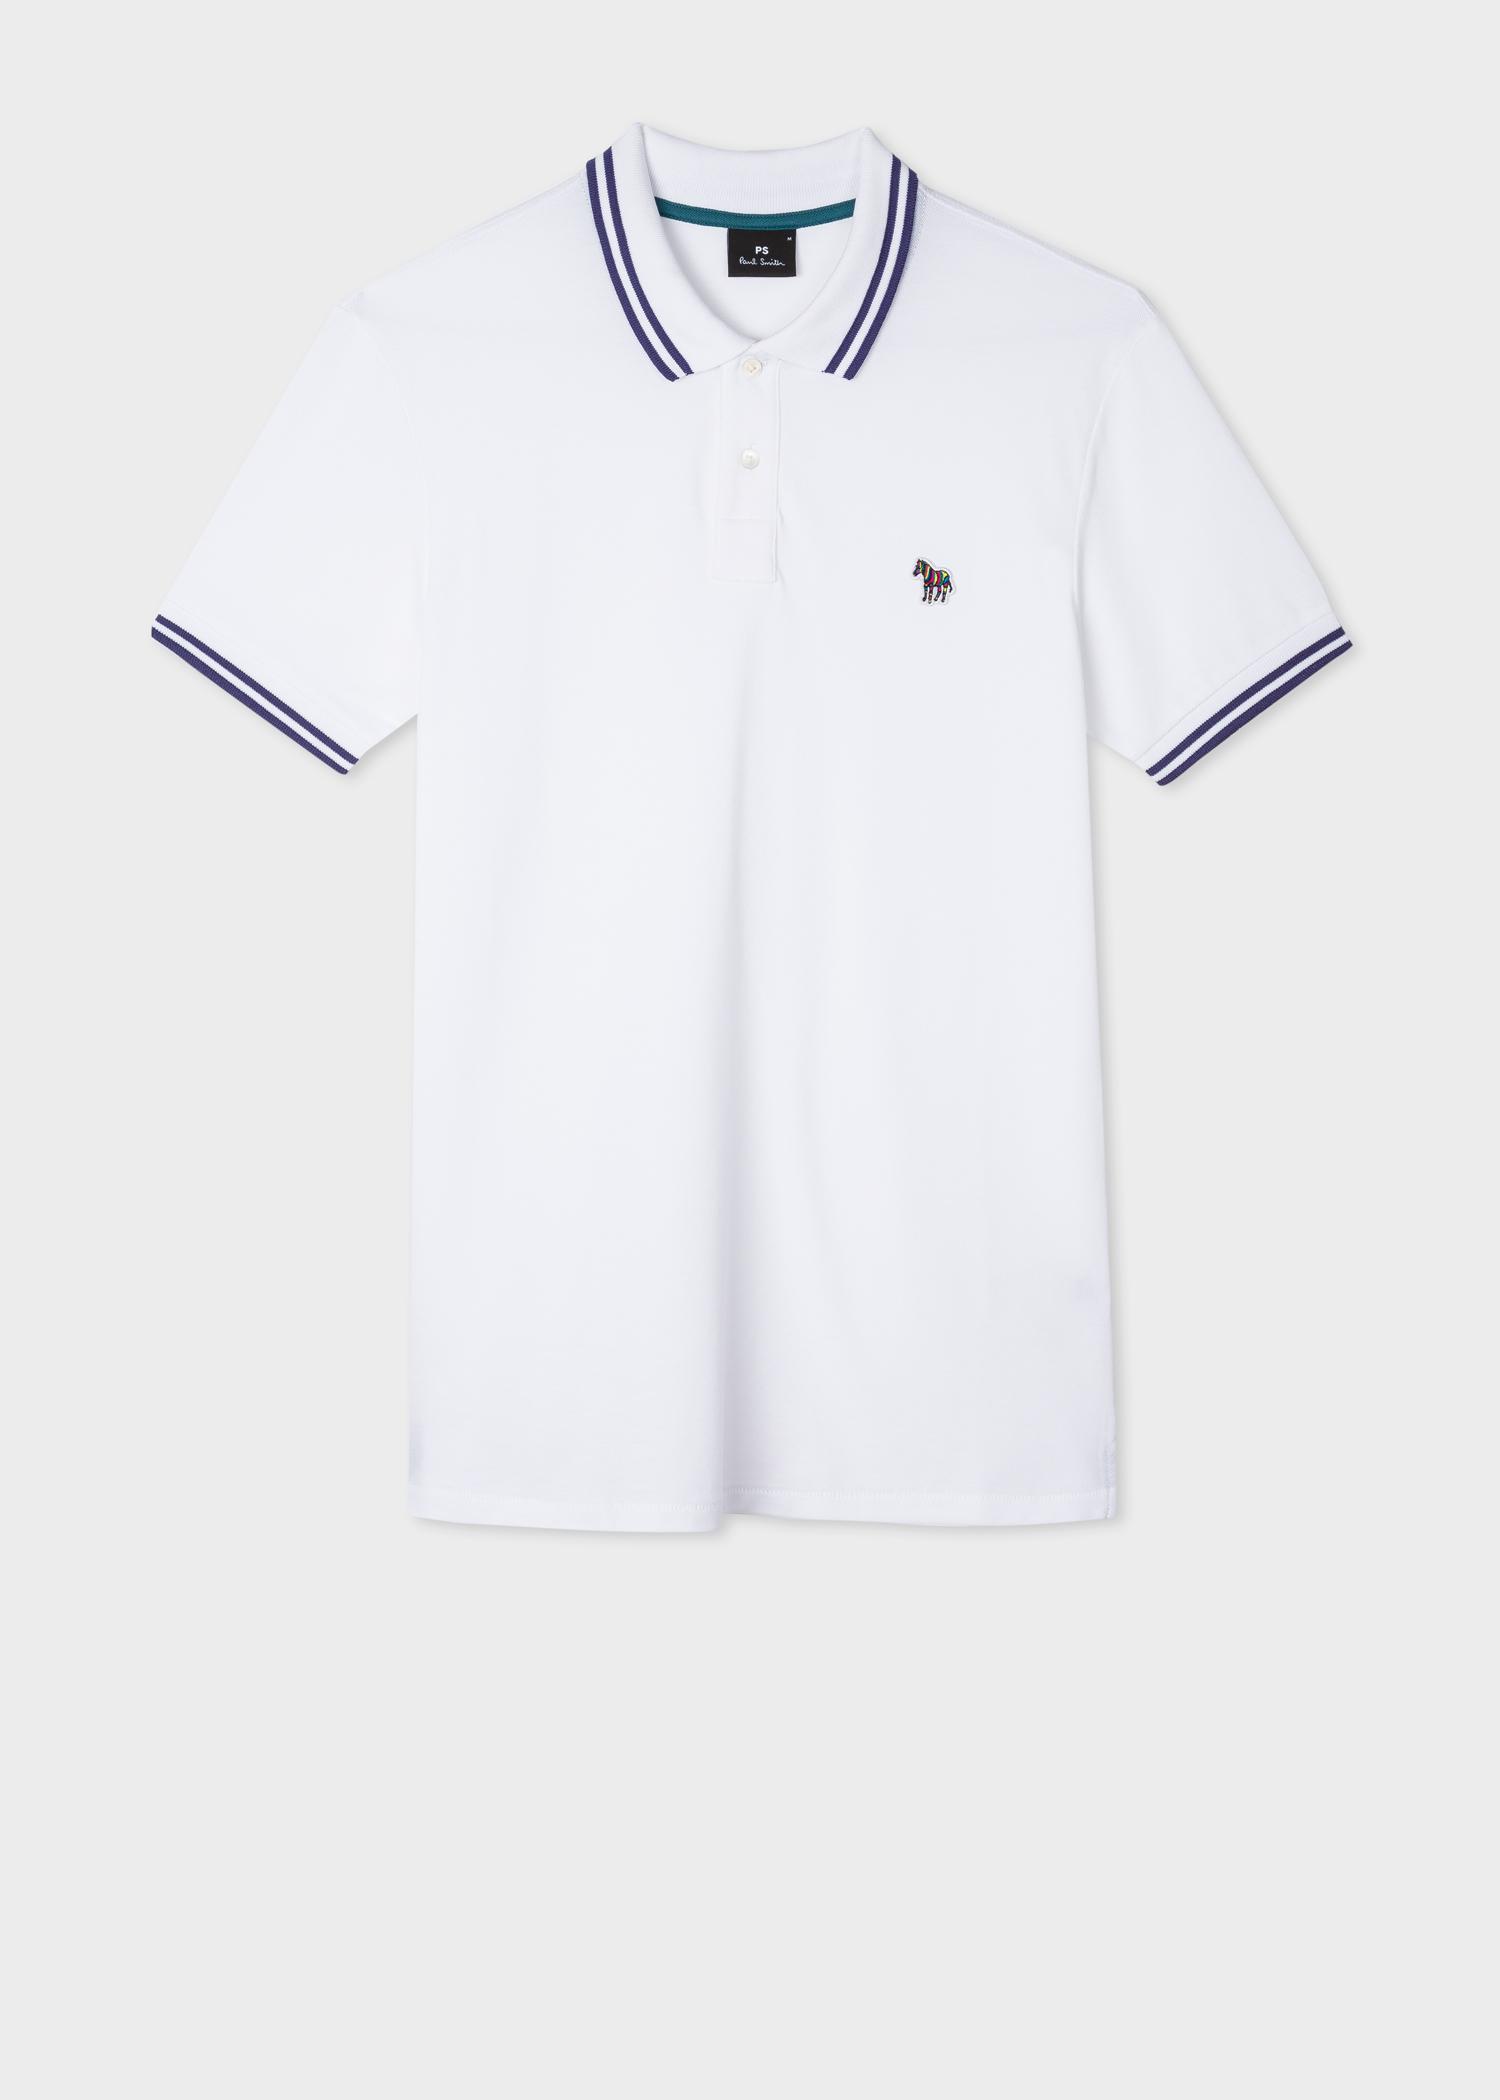 Men's Slim-Fit White Zebra Logo Cotton Polo Shirt With Navy Tipping